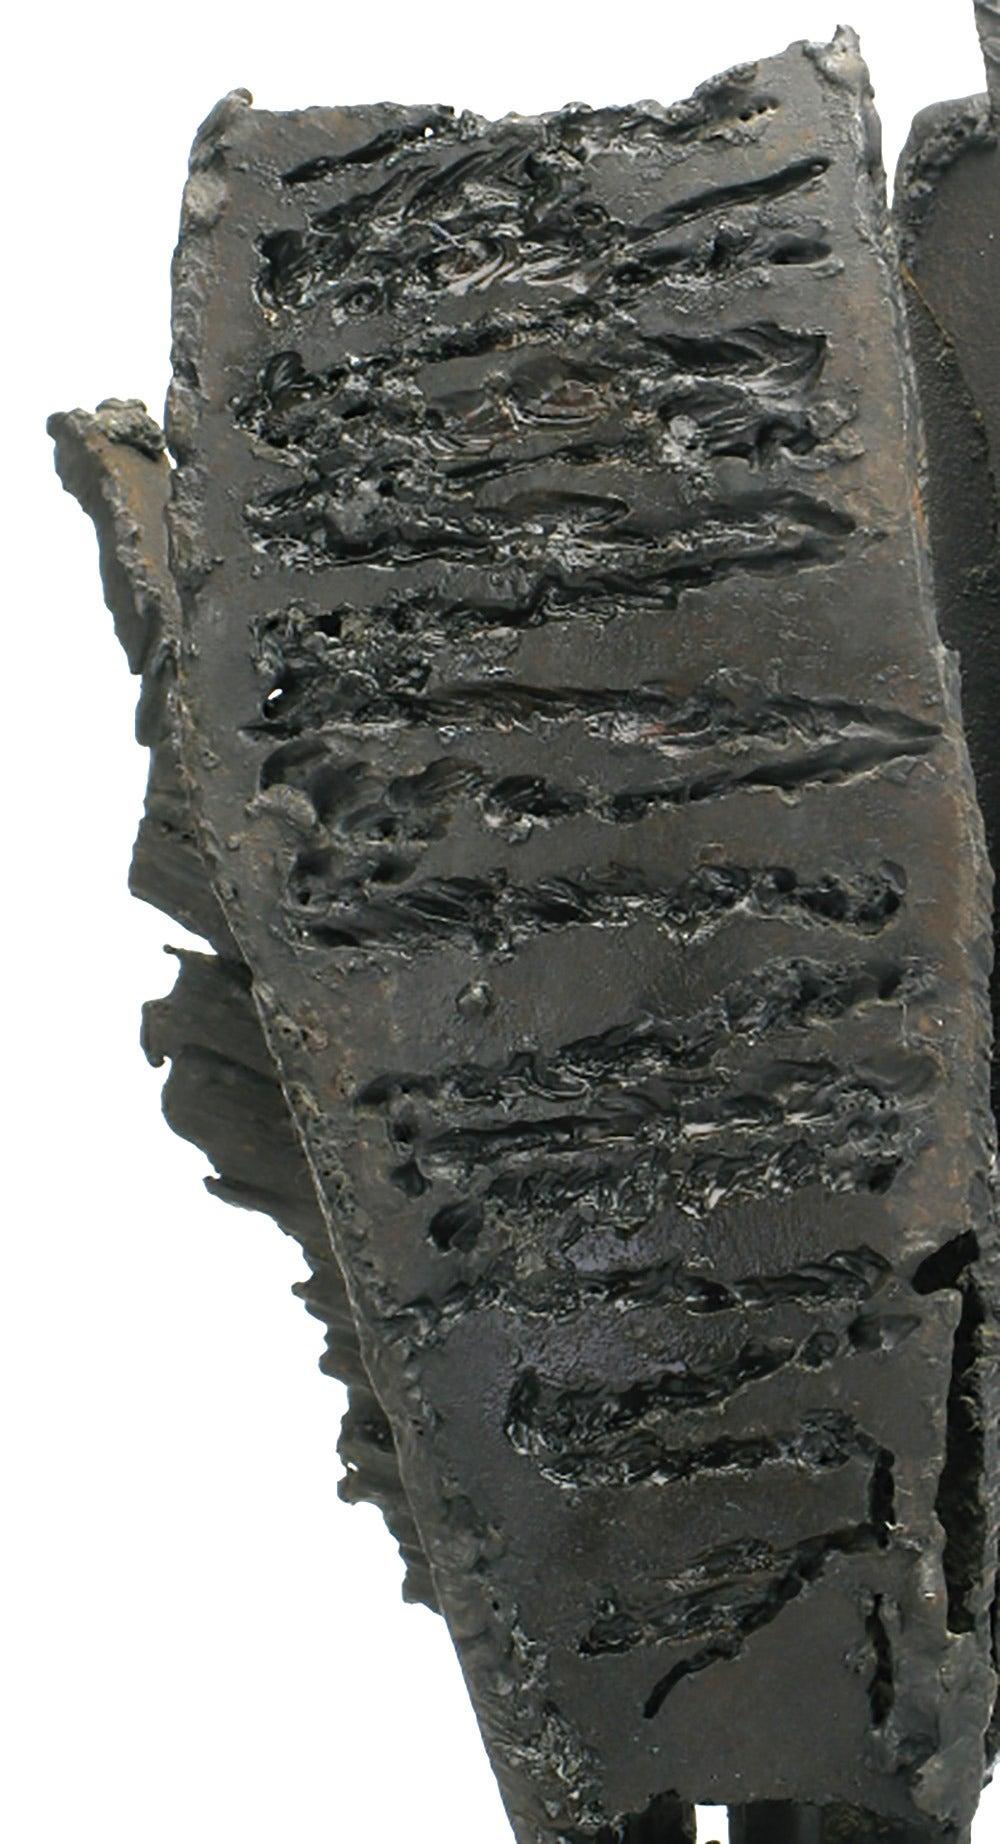 H.I. Gates Brutalist Metal Abstract Sculpture on Wood Base For Sale 1